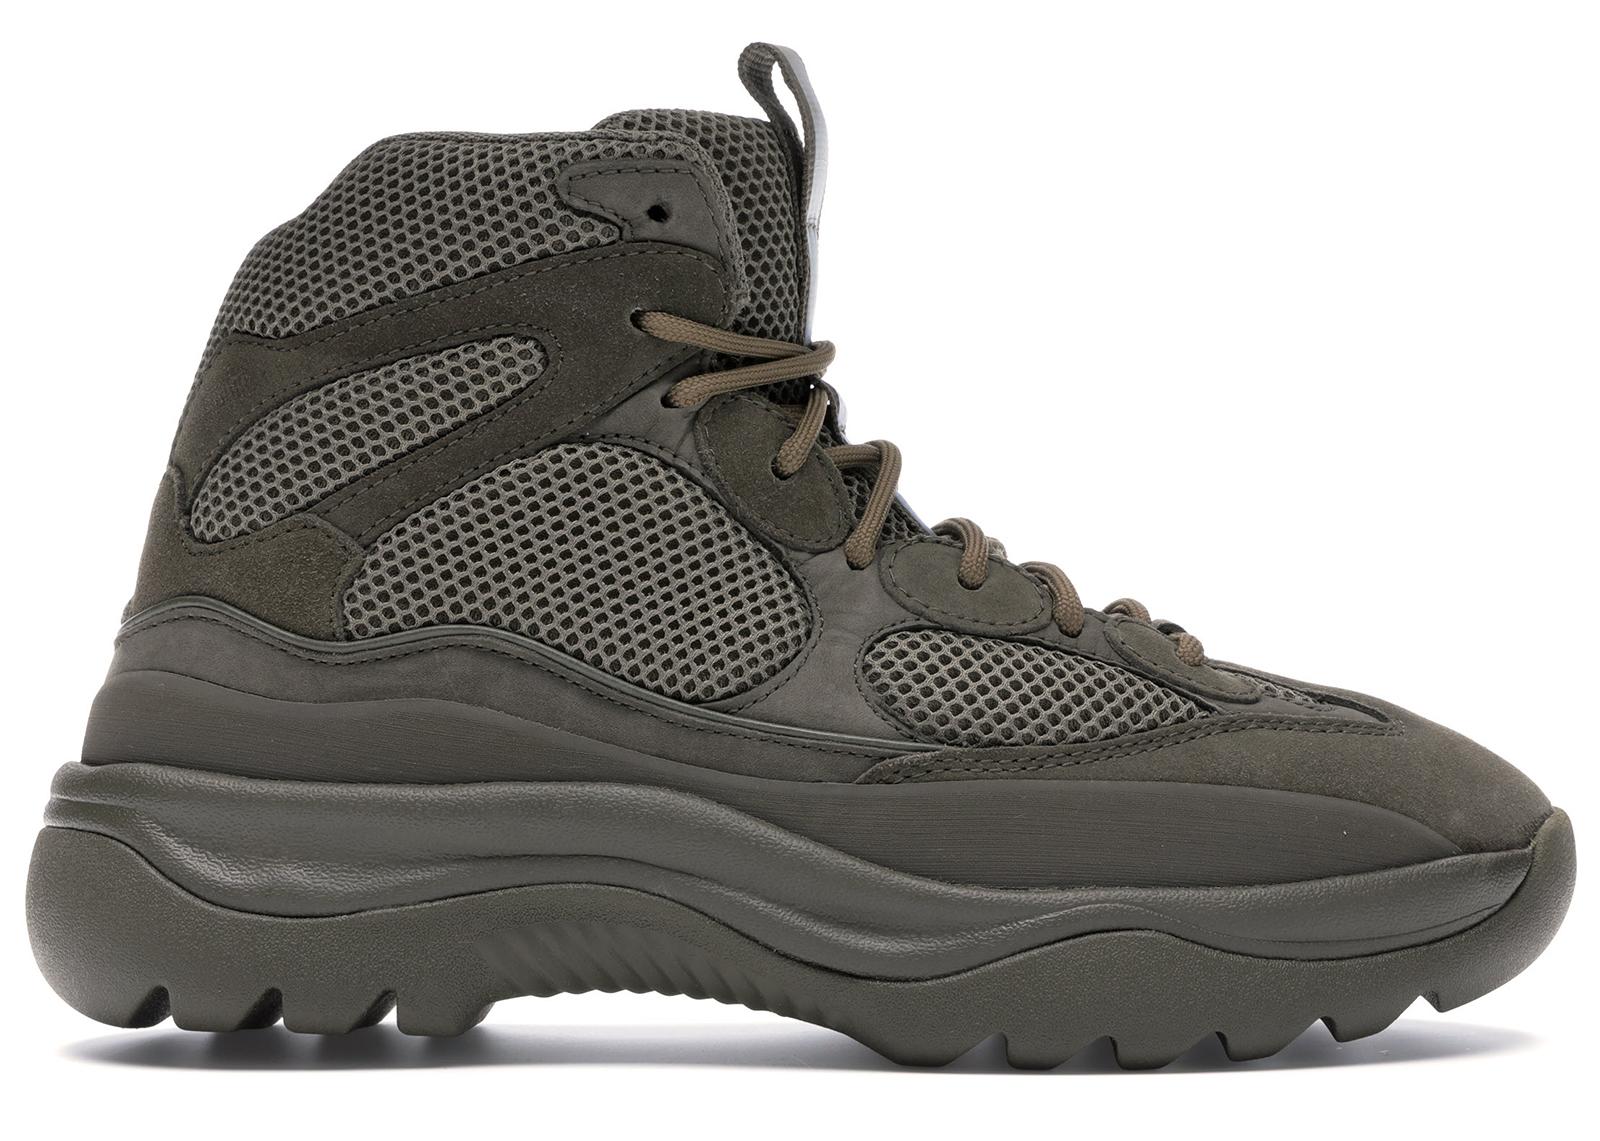 Yeezy Thick Suede Desert Boot Season 7